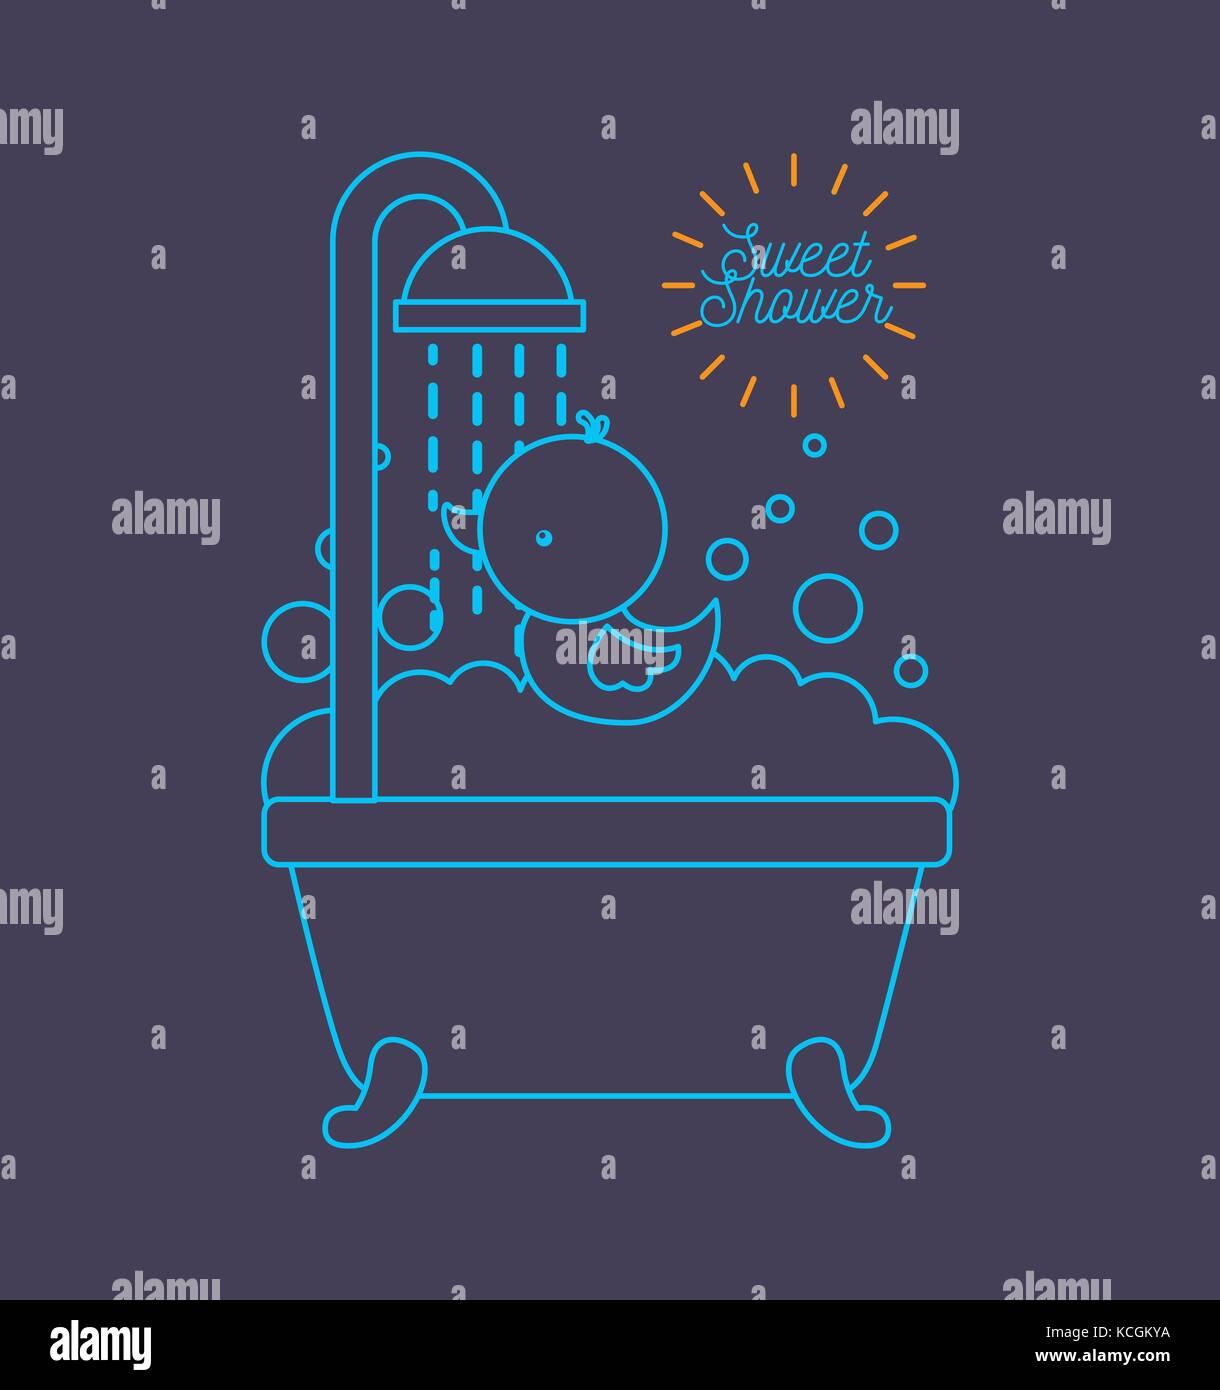 sweet shower bathtub and duck foam bubbles blue background Stock ...